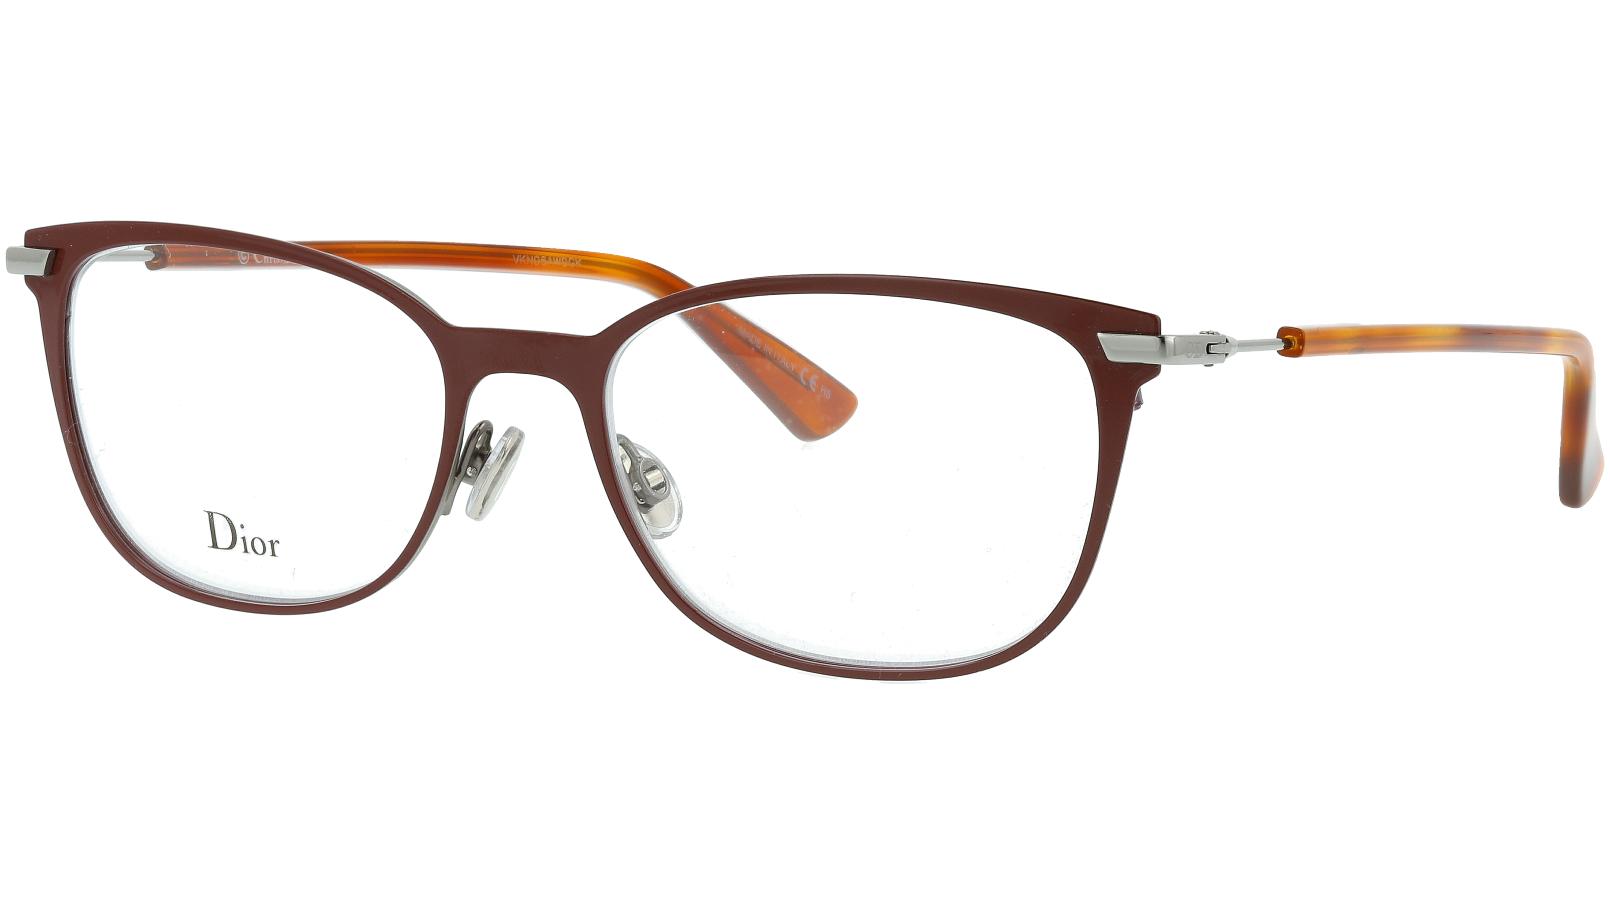 Dior Essence13 LHF 53 BurgunD Glasses